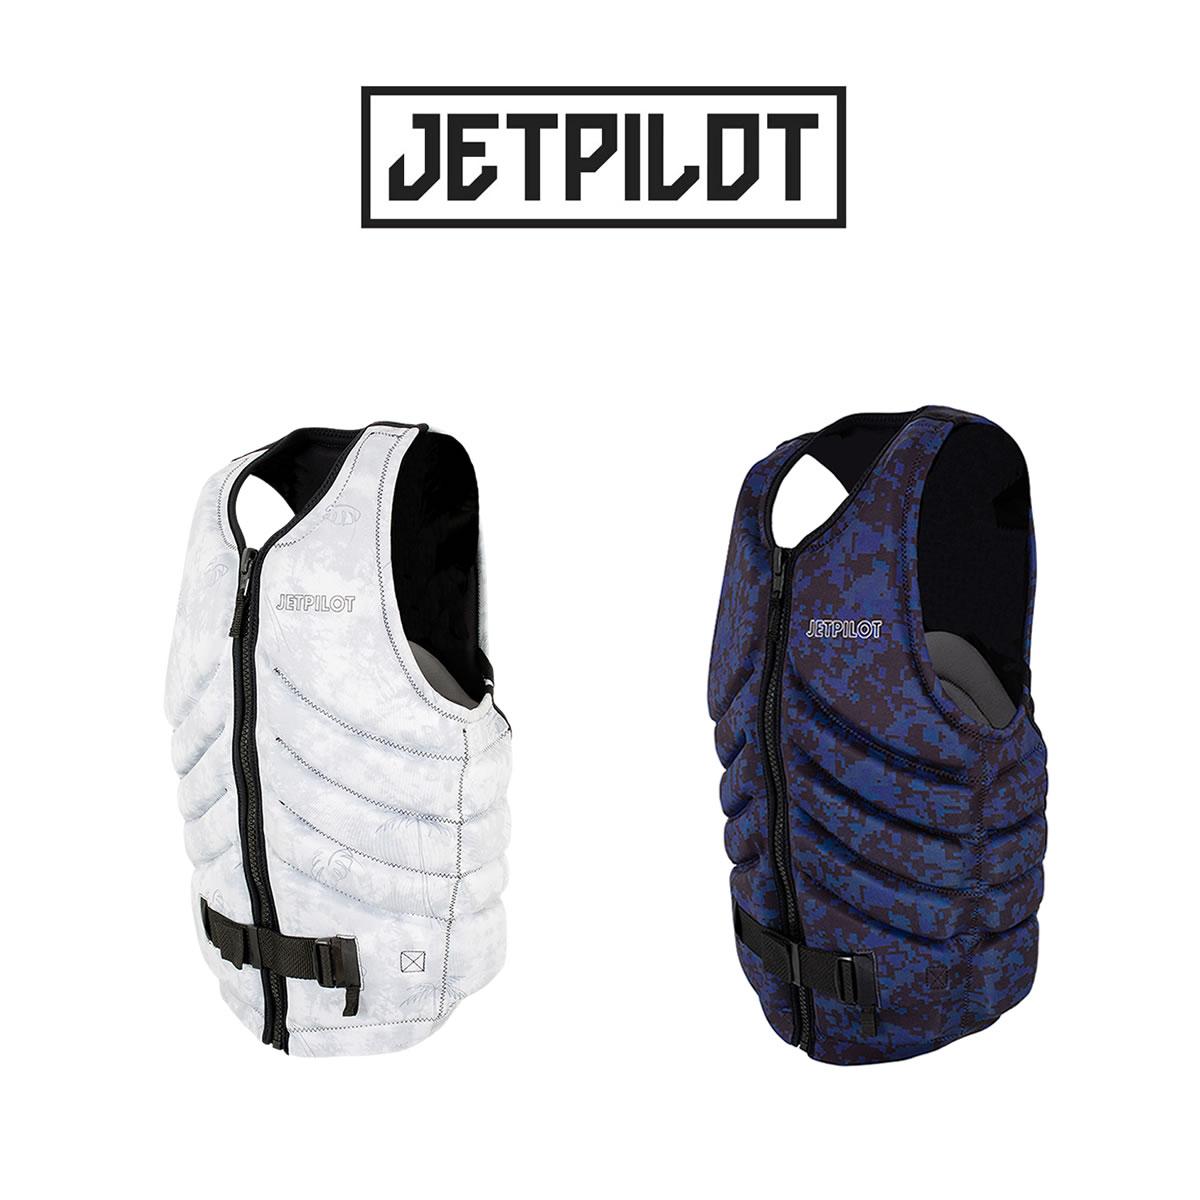 JETPILOT(ジェットパイロット)ネオベスト QUANTUM F/Eネオベスト(JA21299)